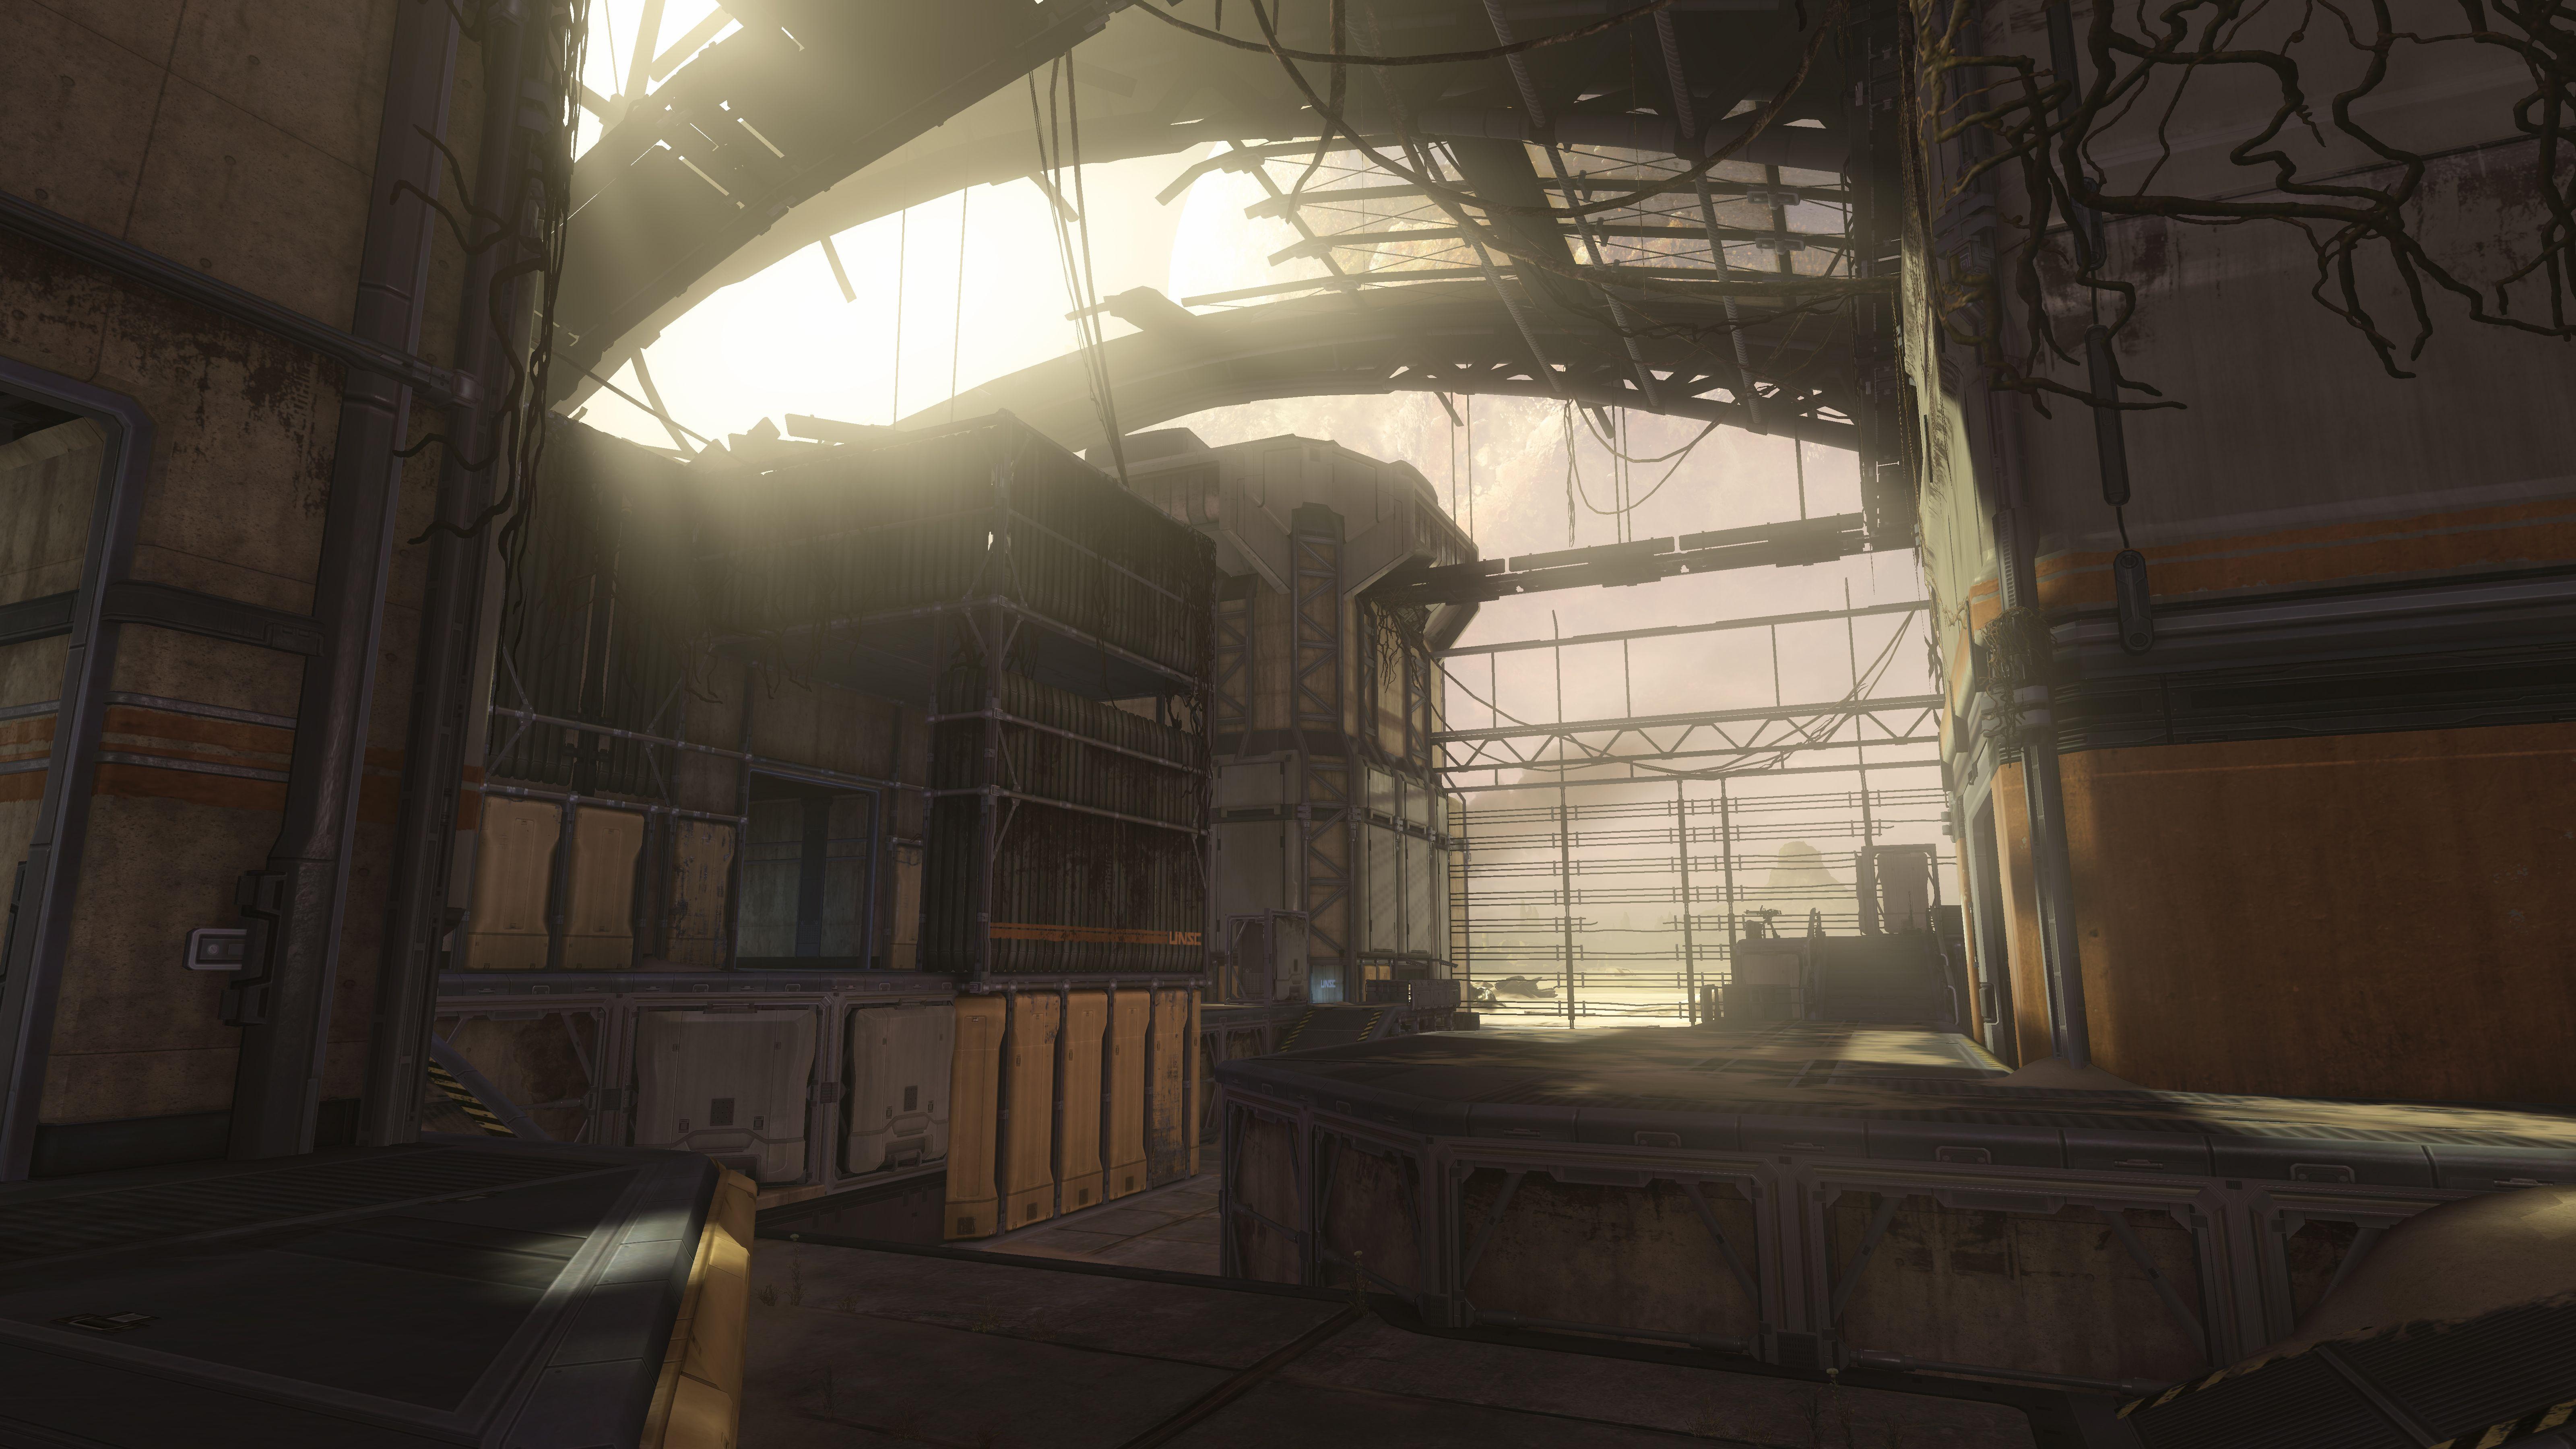 Halo 4 Bullseye Map Pack Certain Affinity Halo 4 Halo Bullseye